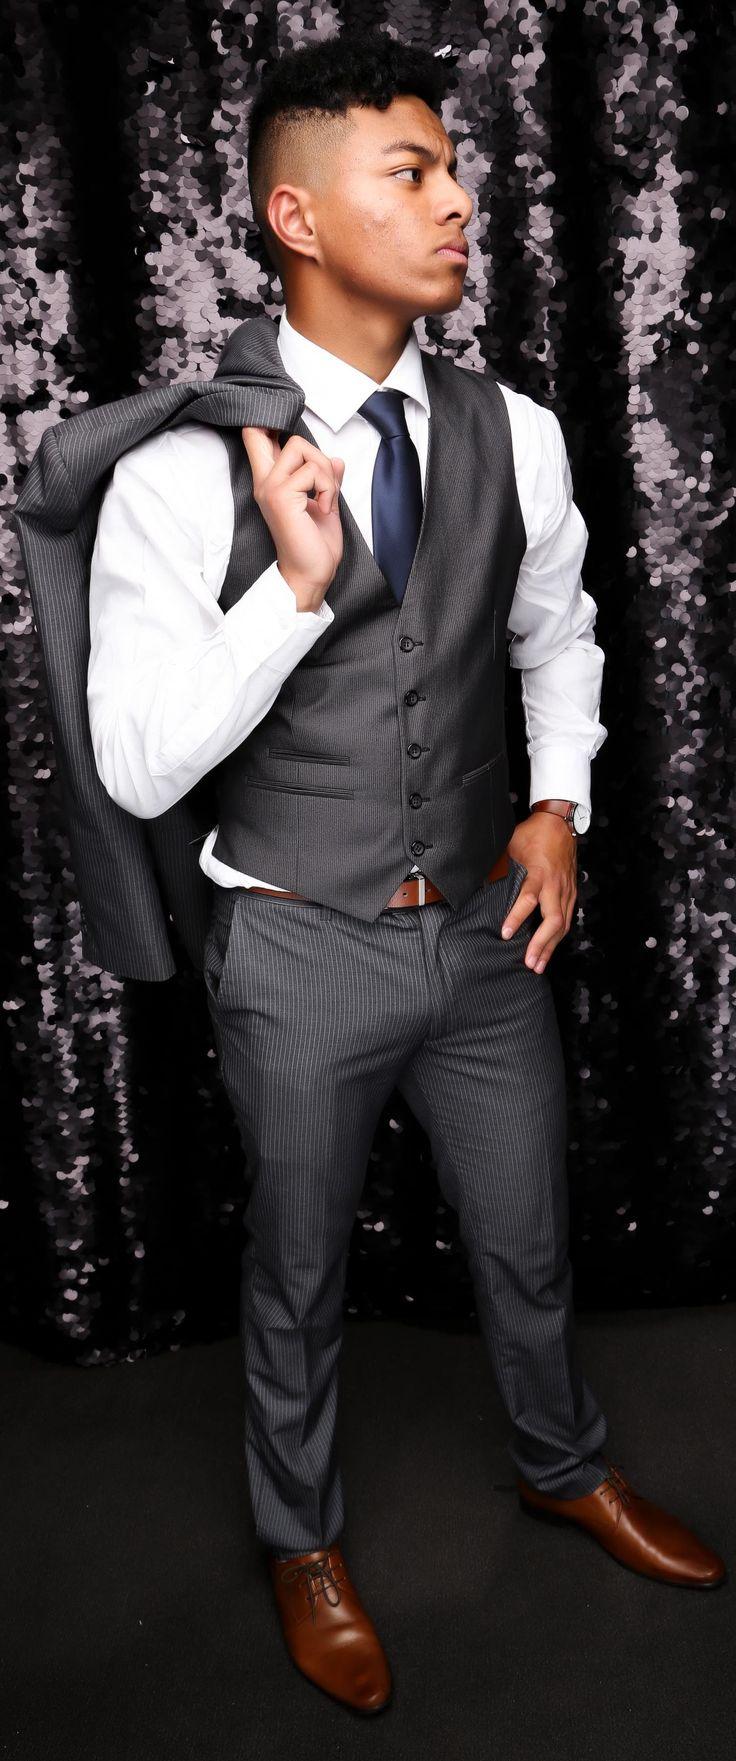 Rosehill College School Ball 2017. Very sharp three-piece suit!